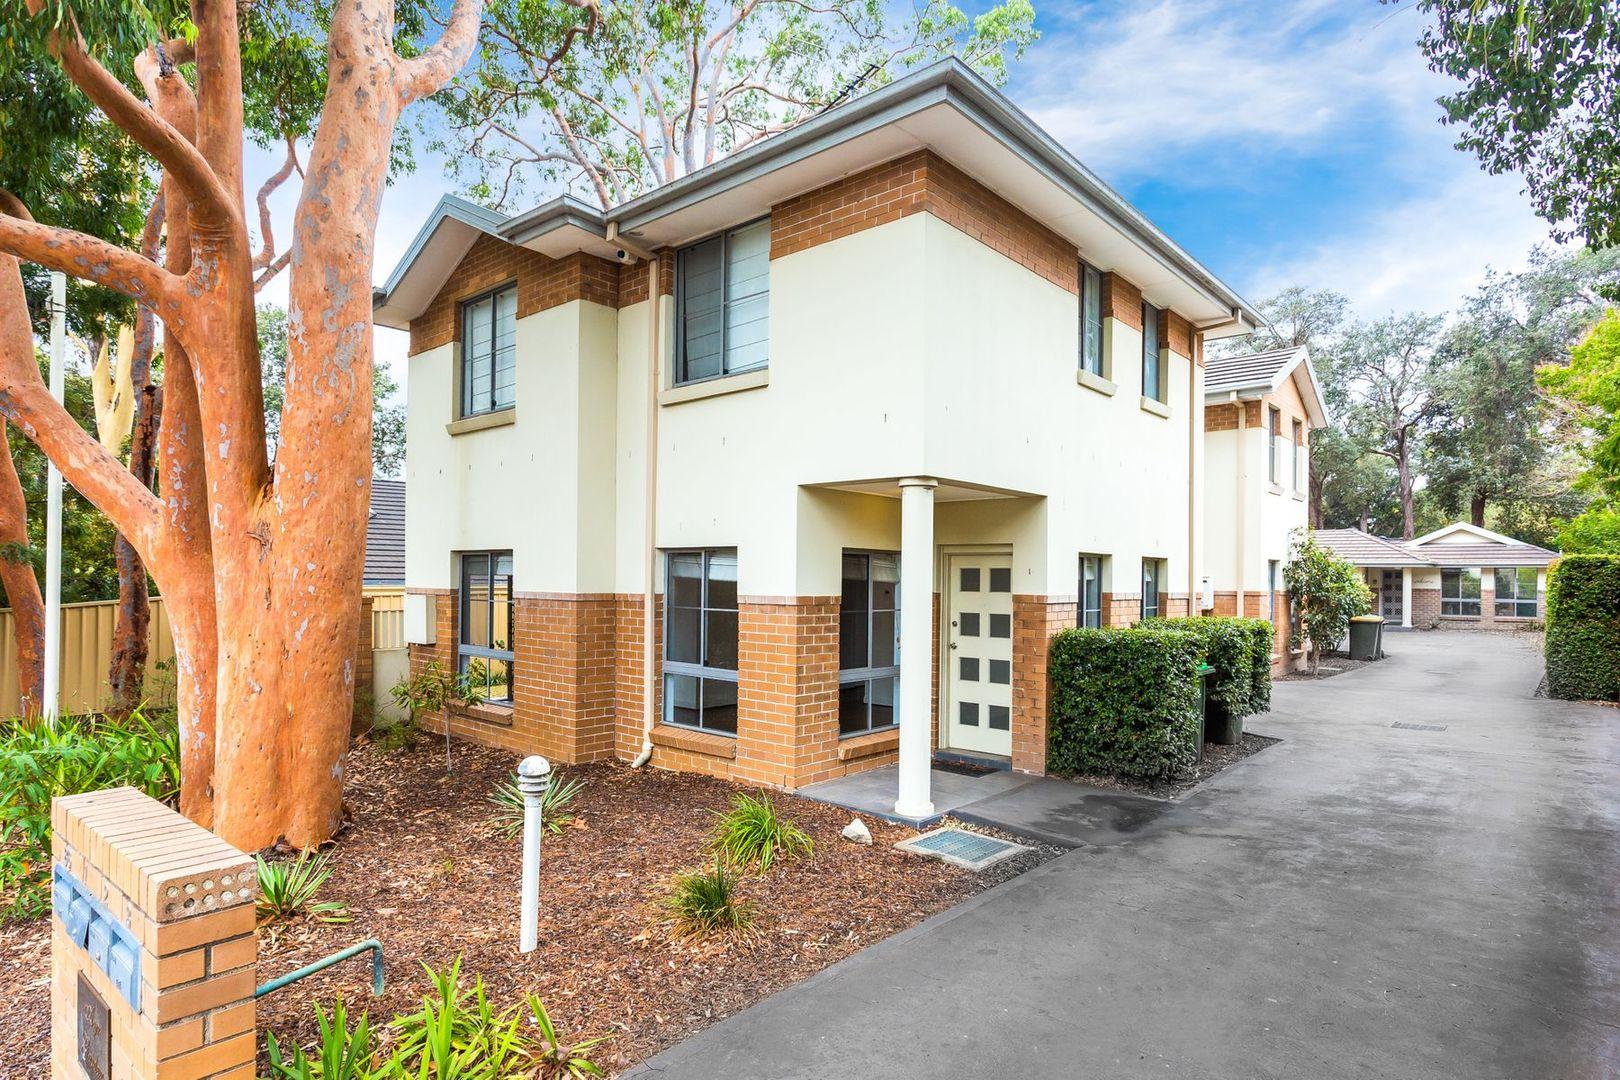 1/86 Belmore Road, Peakhurst NSW 2210, Image 0